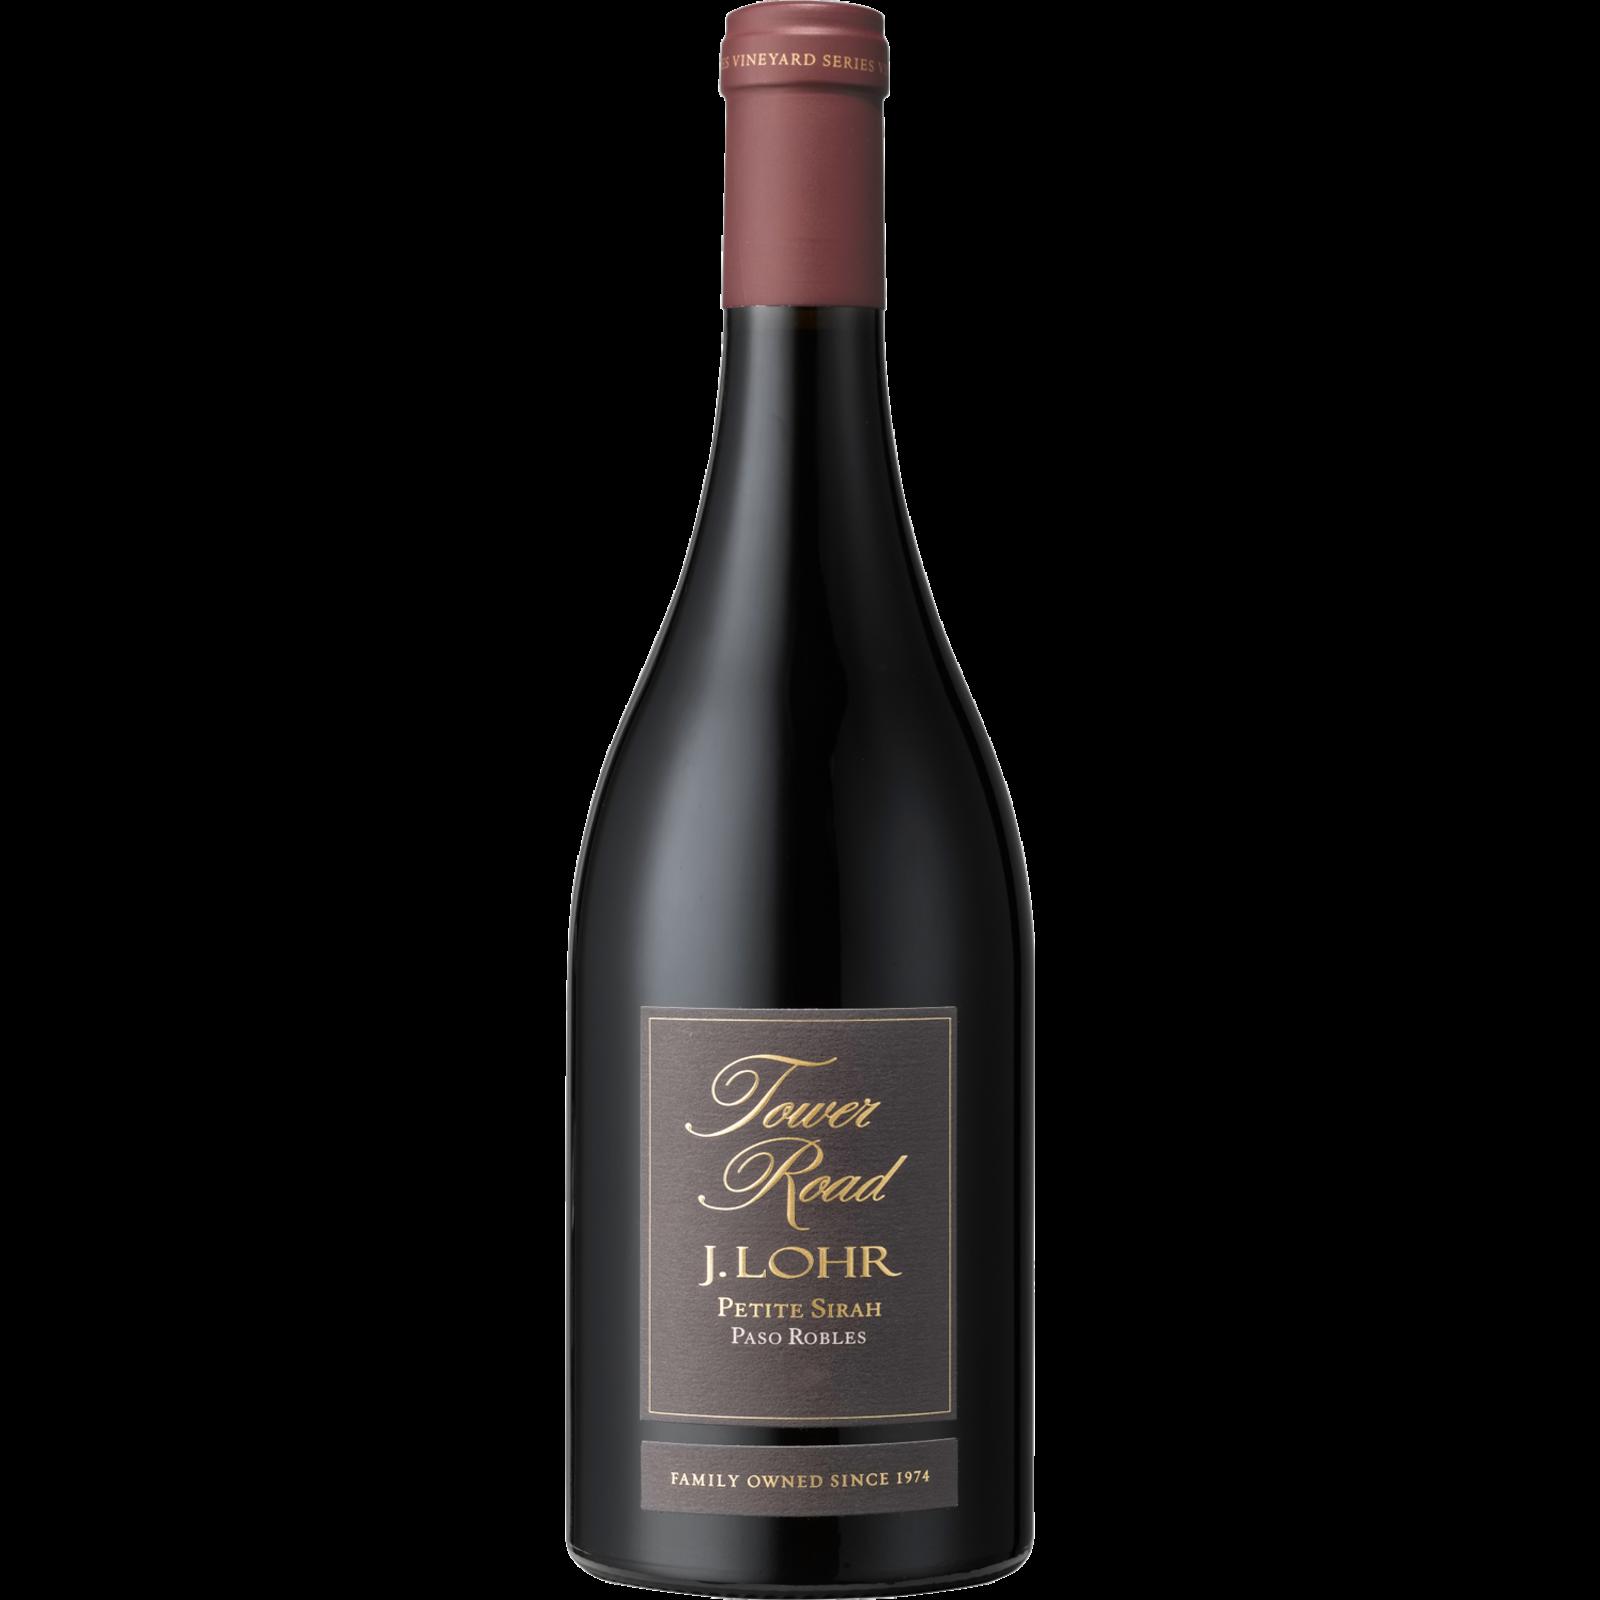 J Lohr Winery Tower Road Petite Sirah 2017